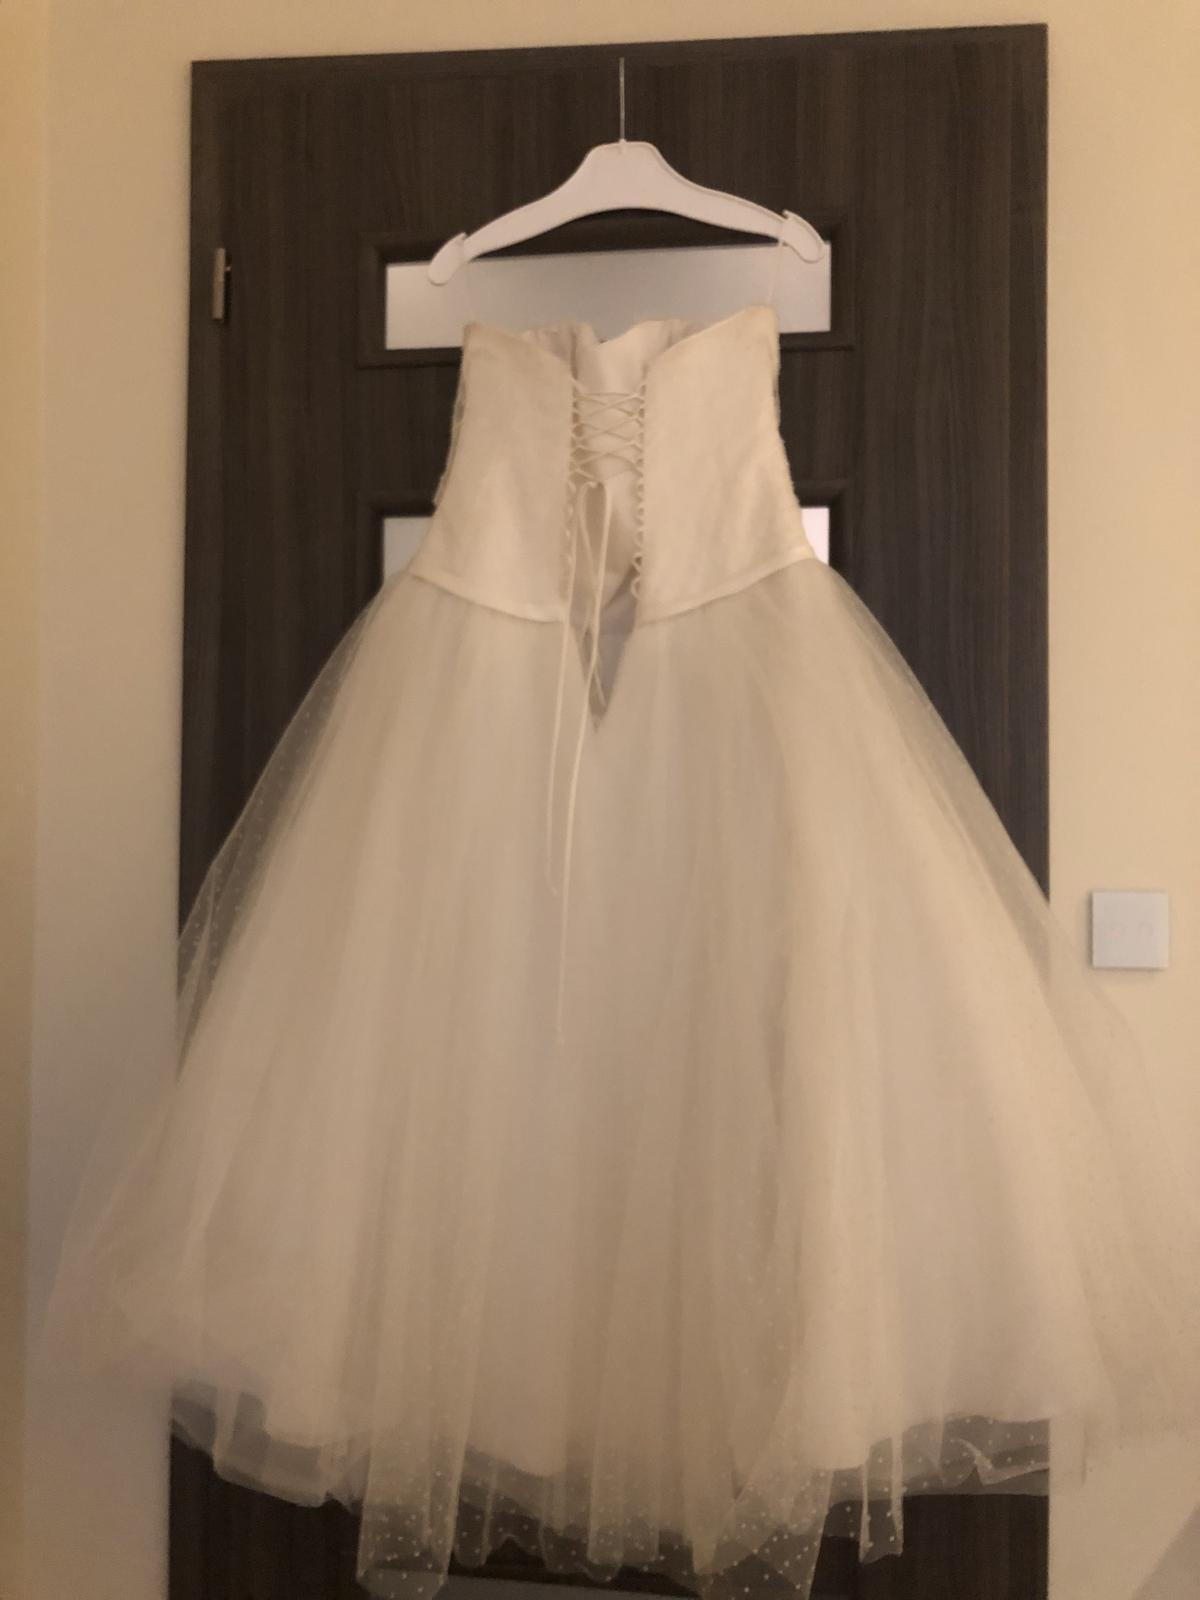 Svadobné šaty ivory s bodkami, po clenky, 36-40 - Obrázok č. 2